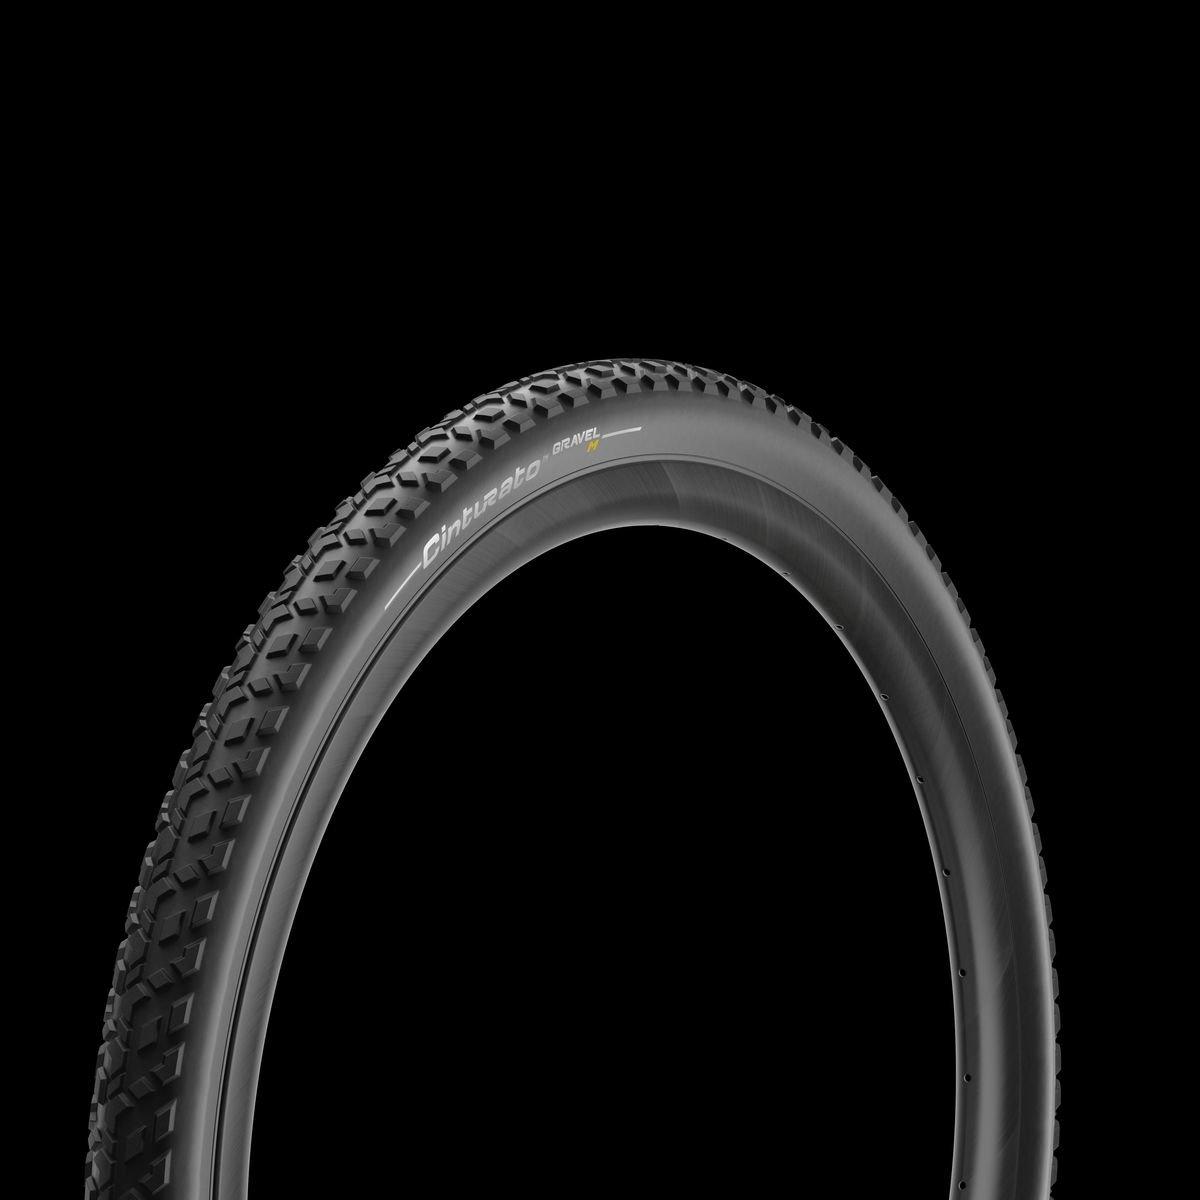 Plášť Pirelli Cinturato™ GRAVEL M 45-584